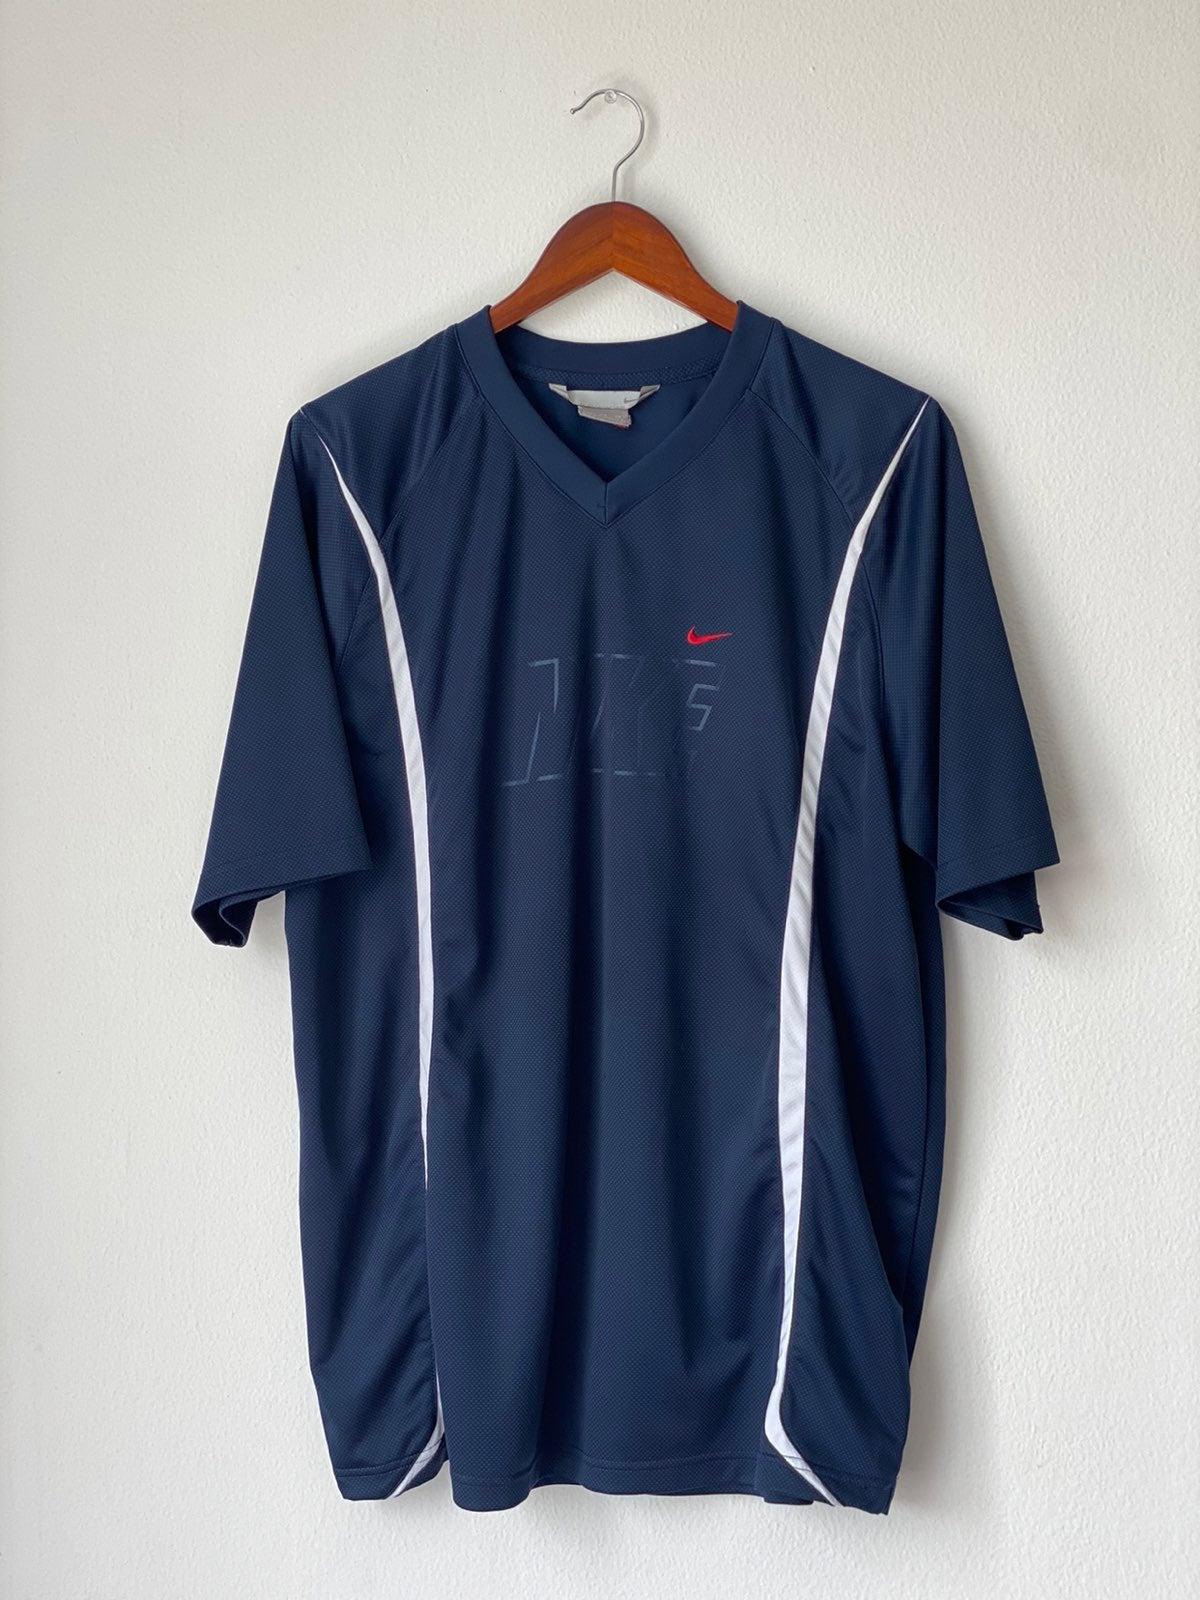 Vintage Nike Mesh Shirt Sz XL